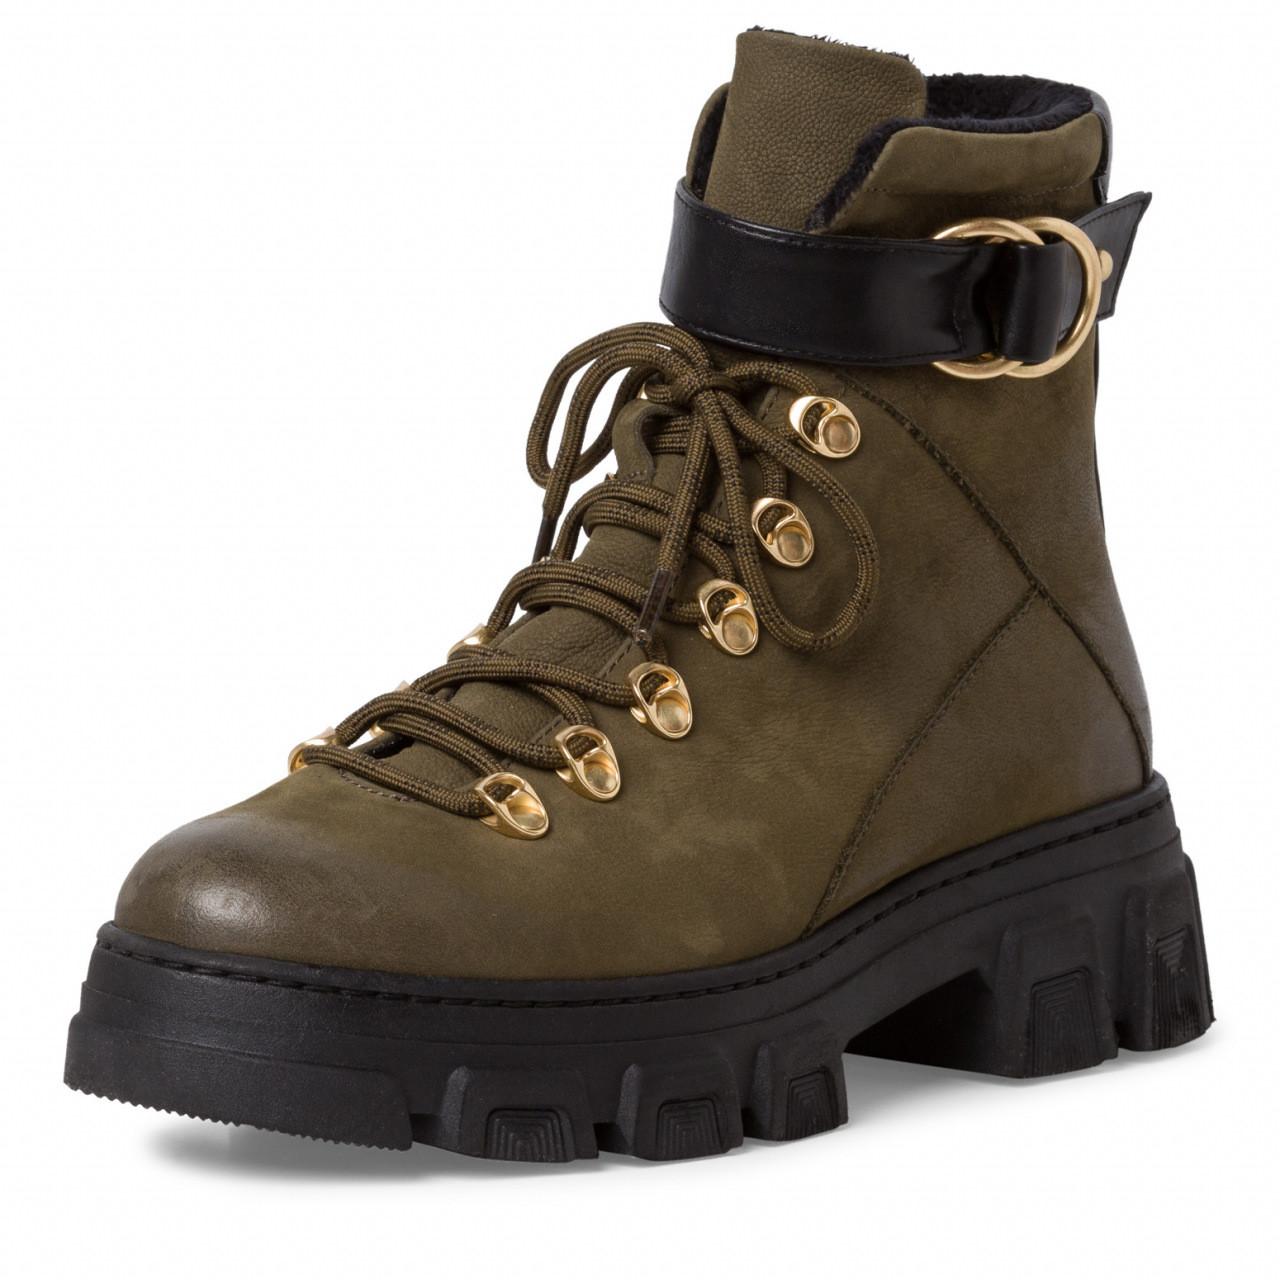 Grønne støvler Tamaris